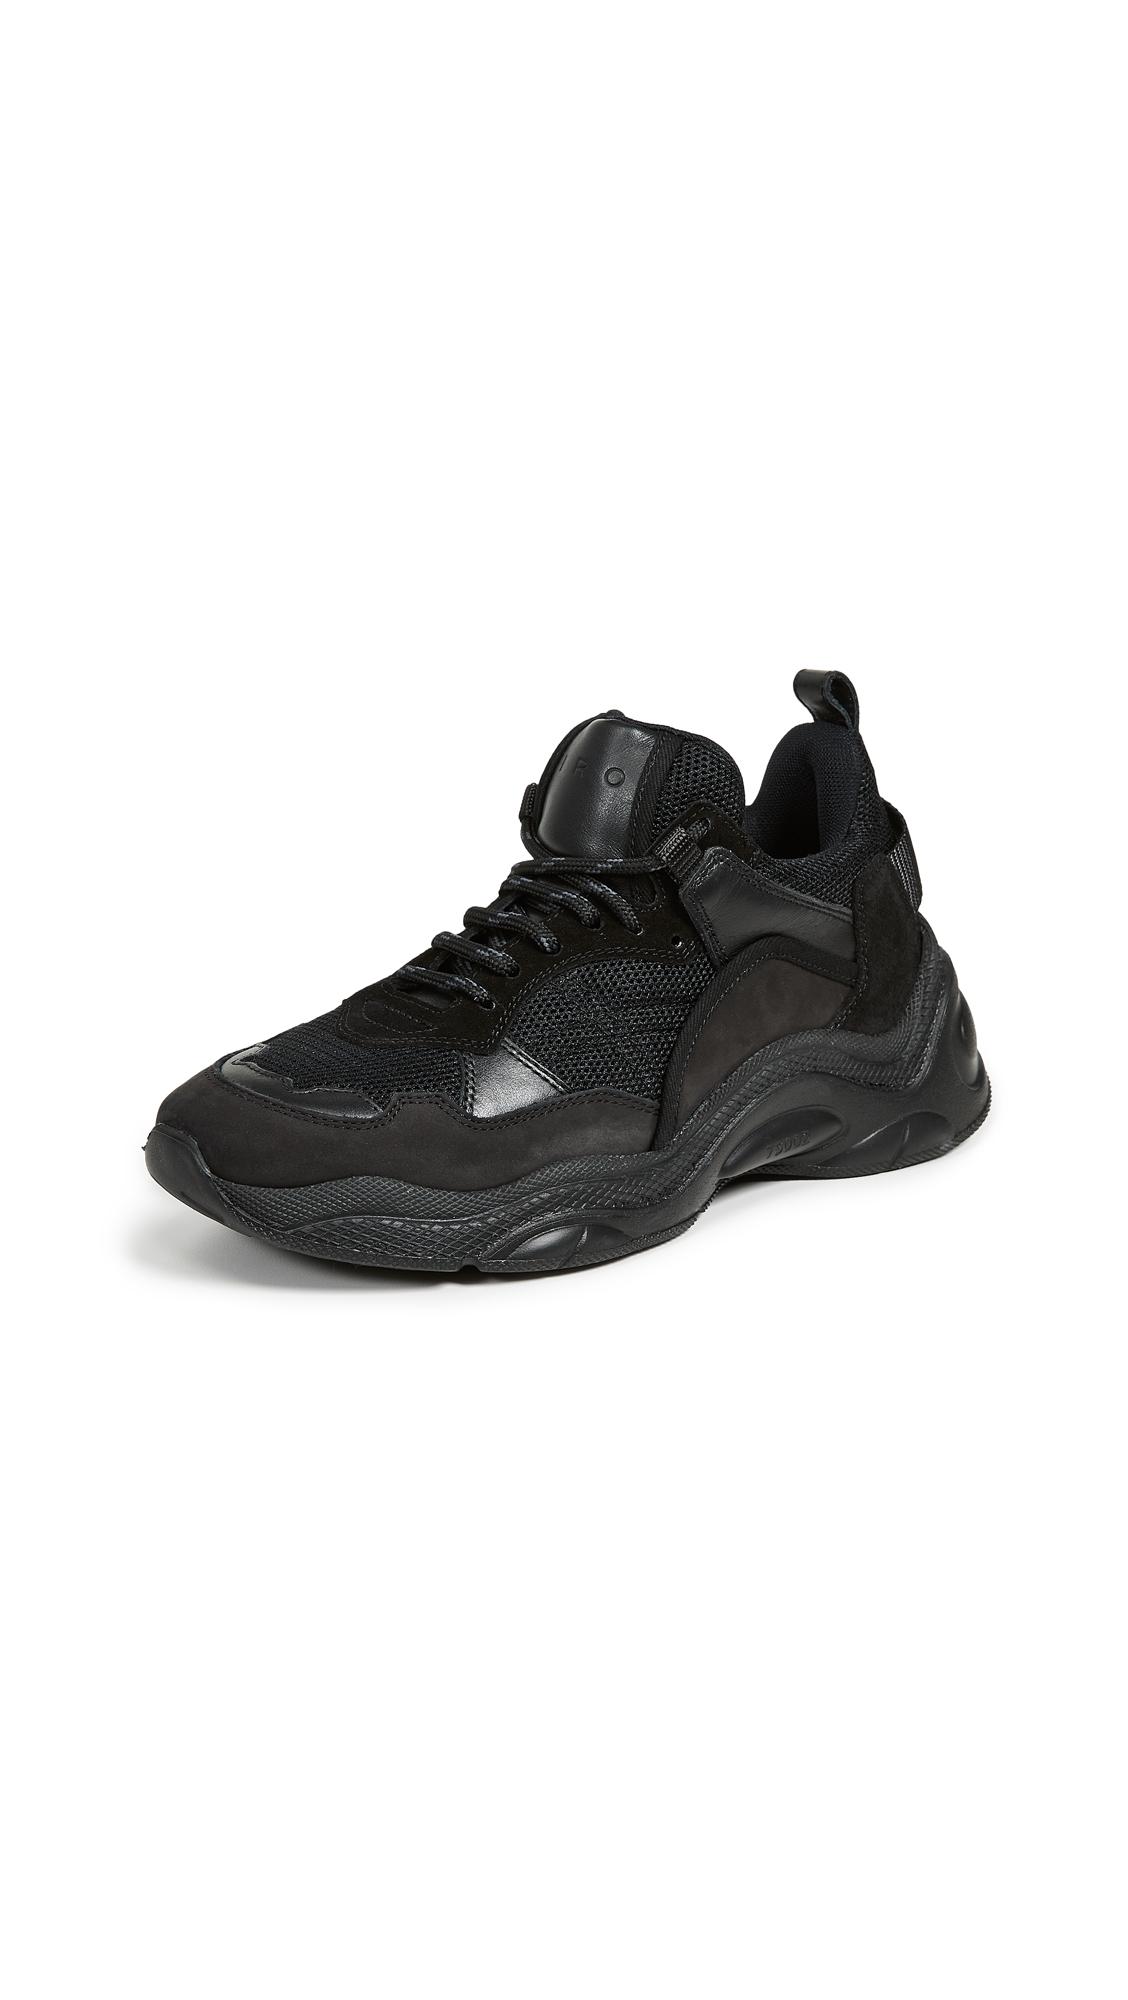 IRO Curverunner Sneakers - Black